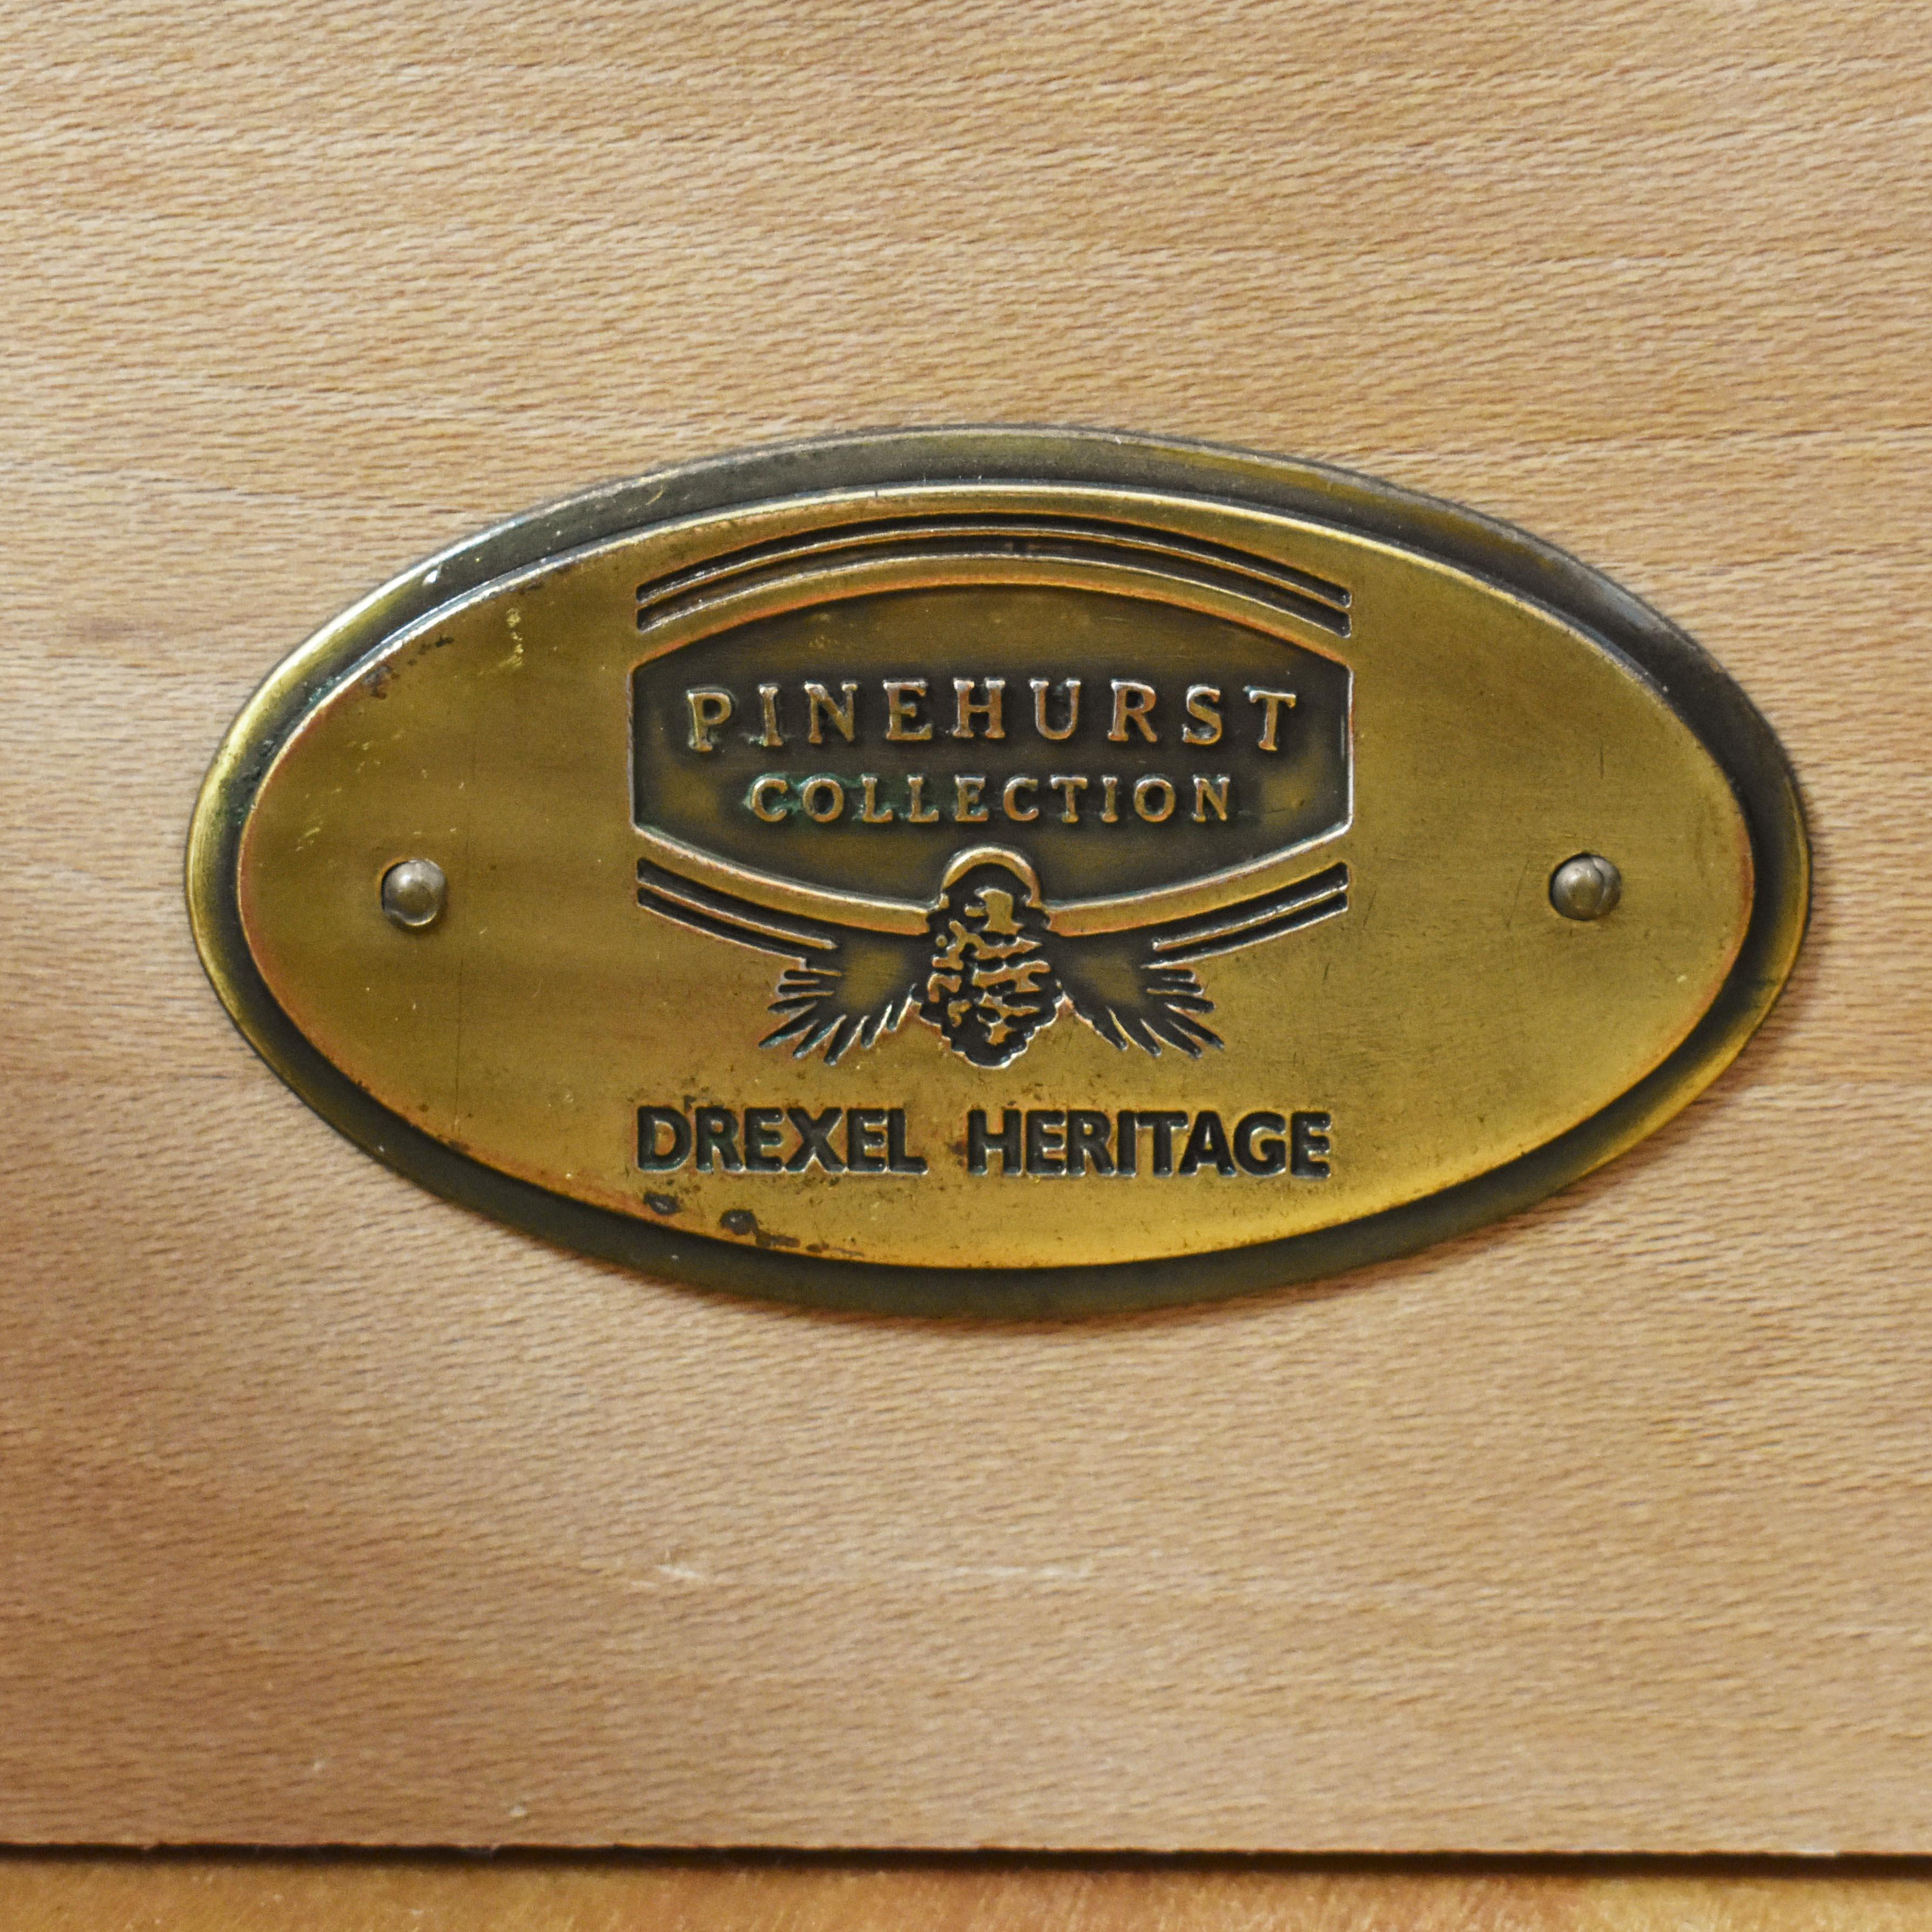 Drexel Heritage Drexel Heritage Pinehurst Accent Cabinet Cabinets & Sideboards